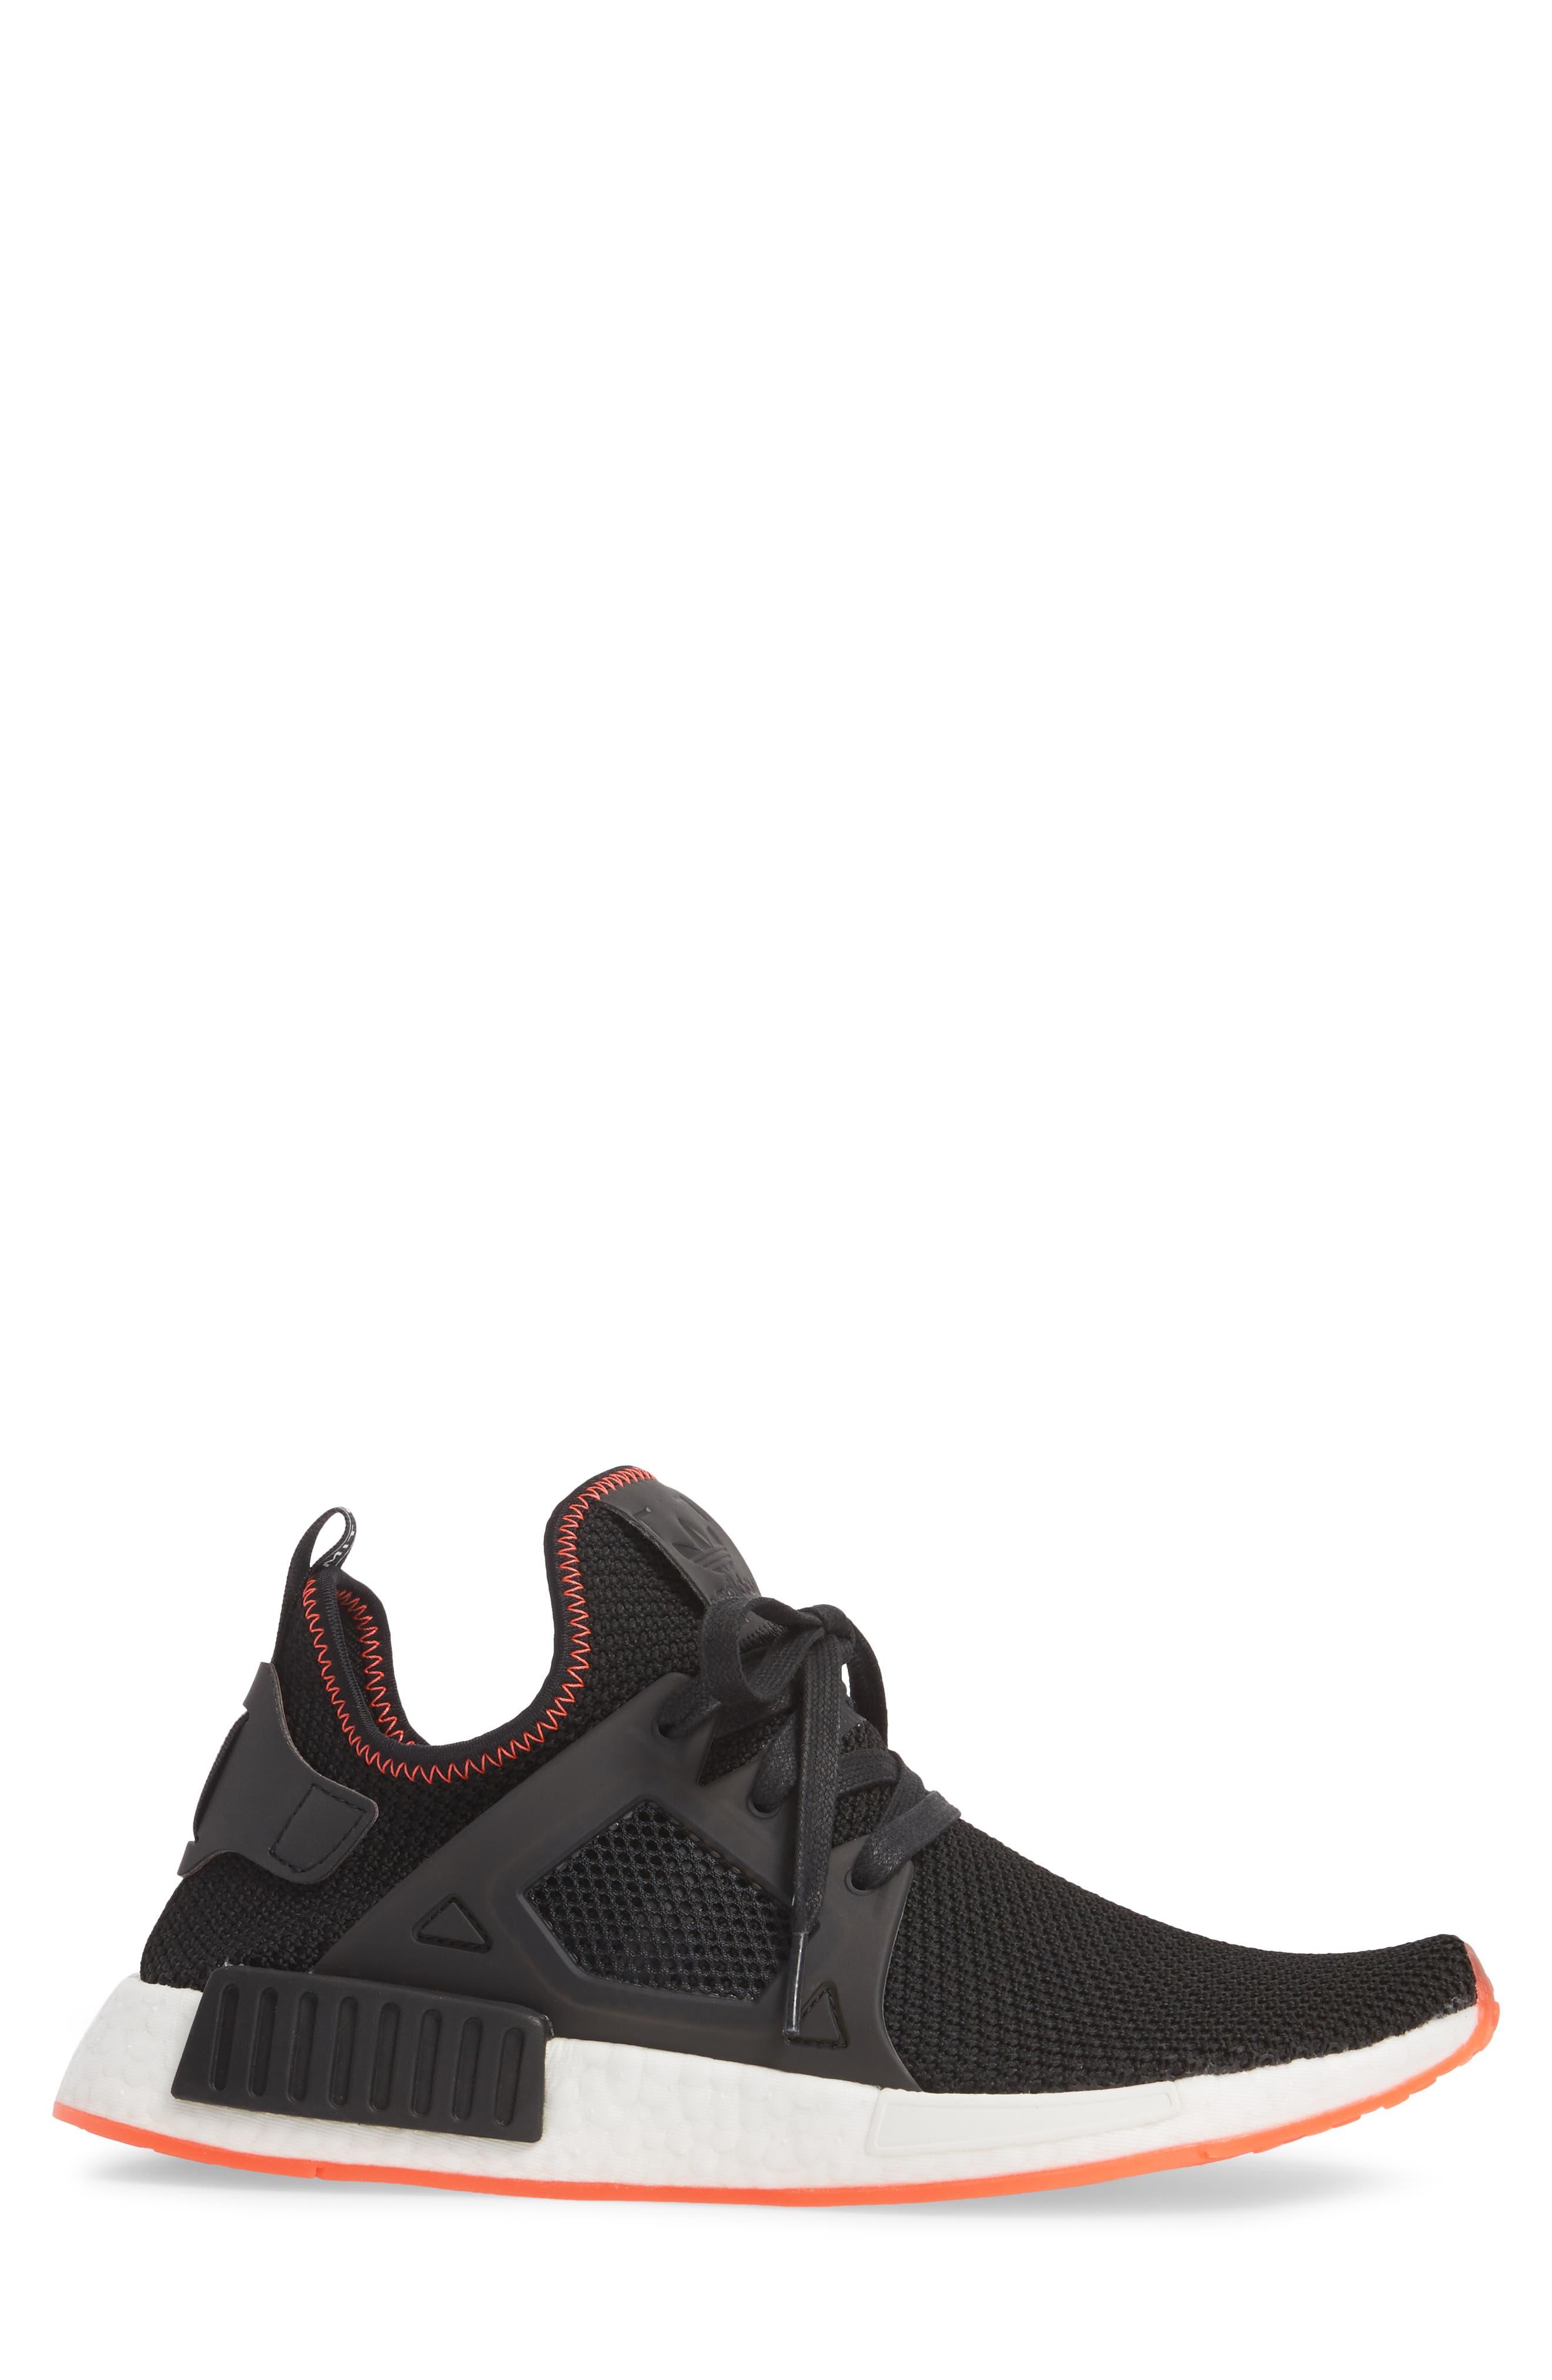 NMD_XR1 Sneaker,                             Alternate thumbnail 5, color,